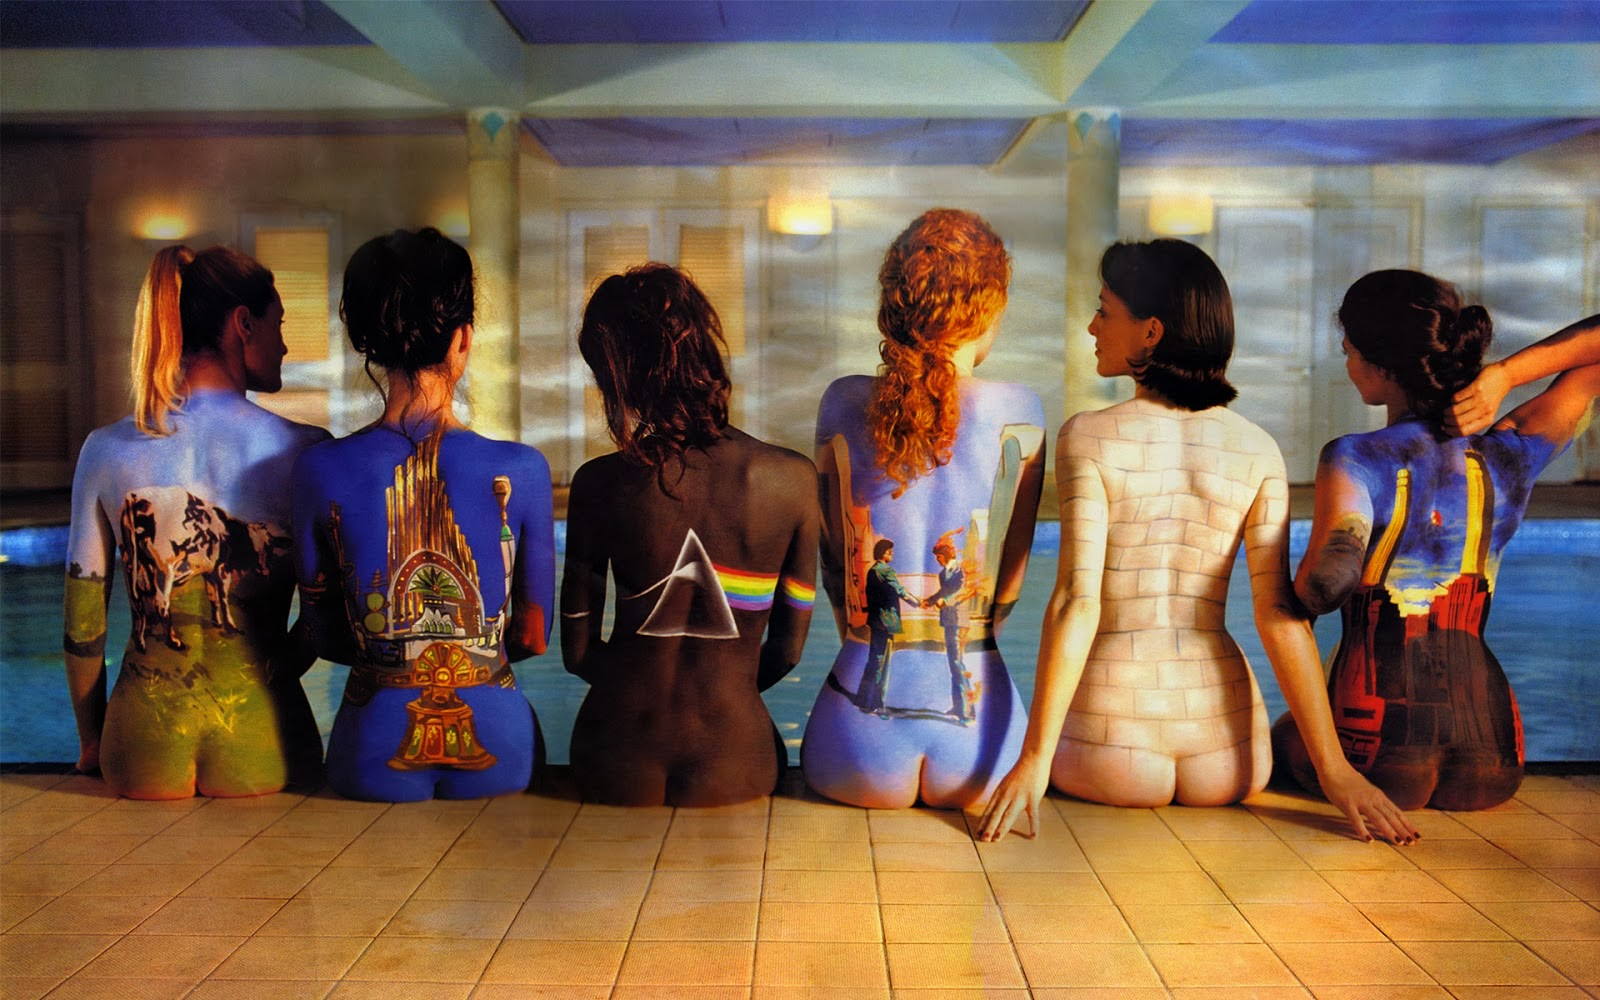 2ª Semifinal: Genesis vs. Pink Floyd Storm-thorgerson-pink-floyd-back-catalogue-2